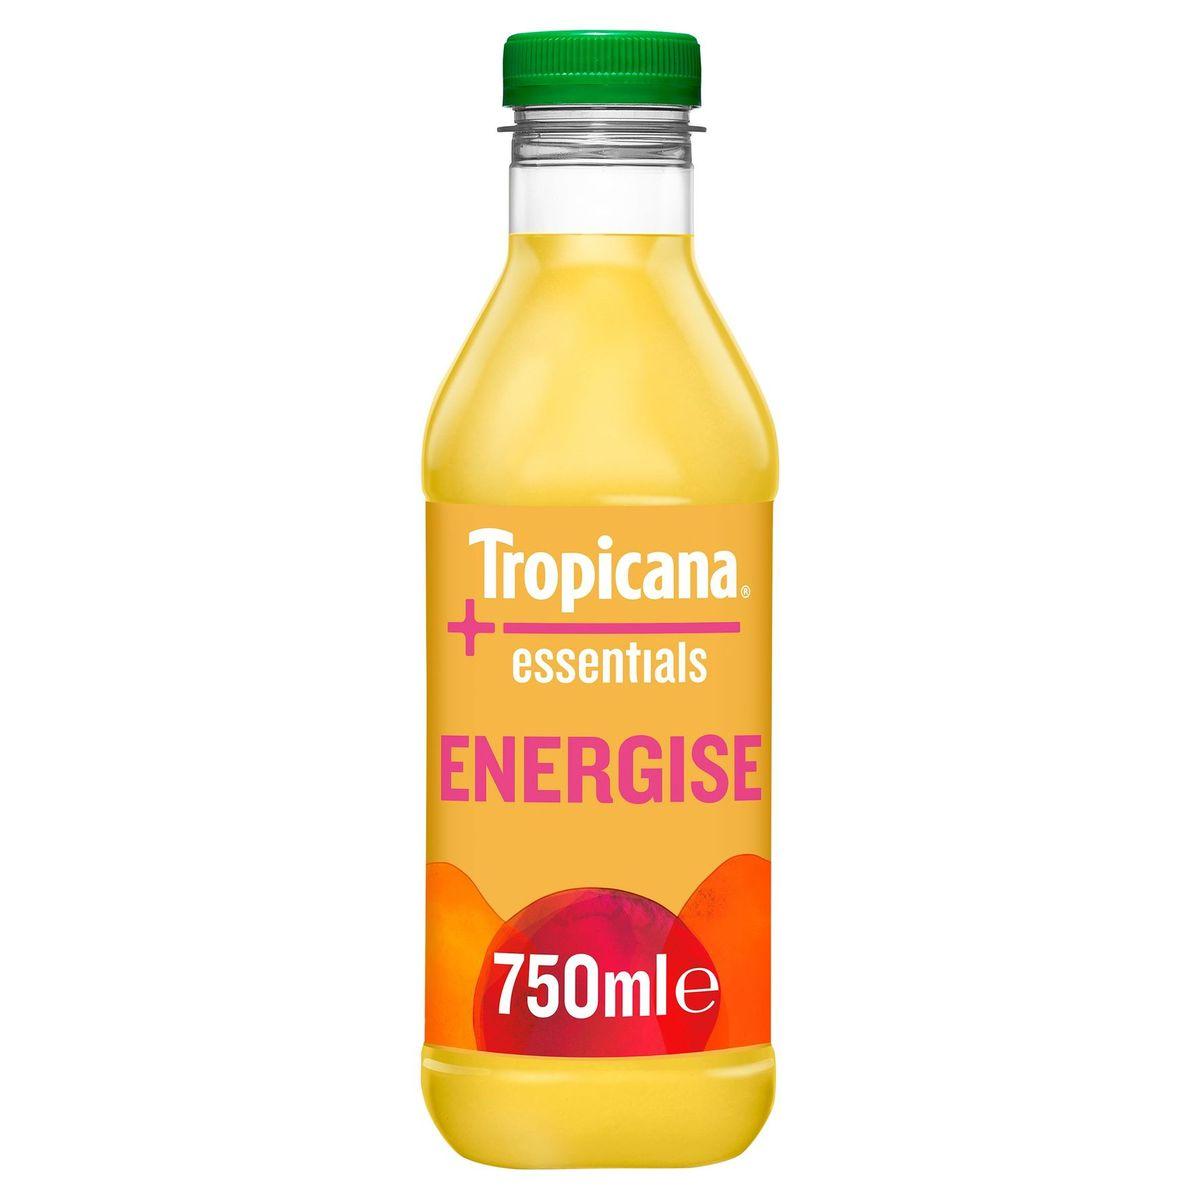 Tropicana Essentials Energise Versfruit Sap 750 ml